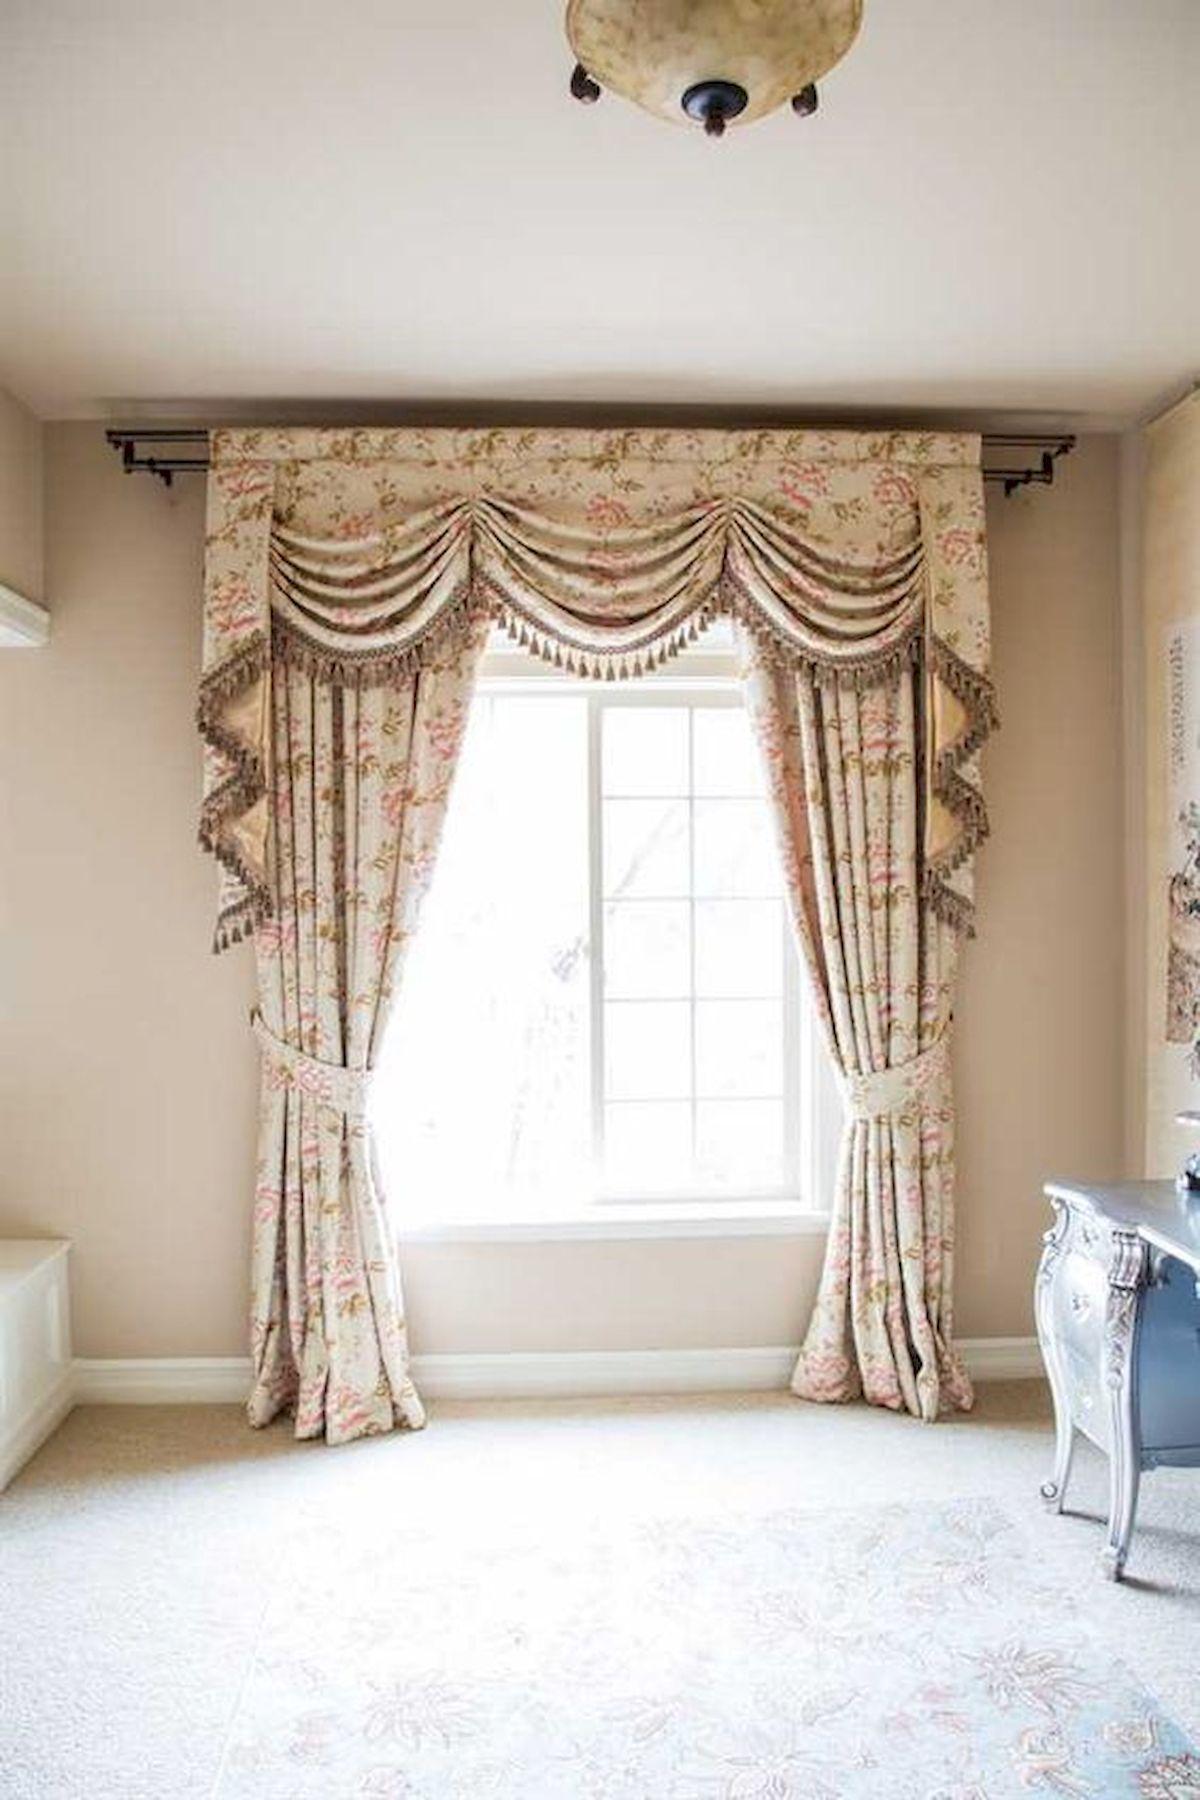 65 Adorable Window Curtains Design Ideas And Decor Window